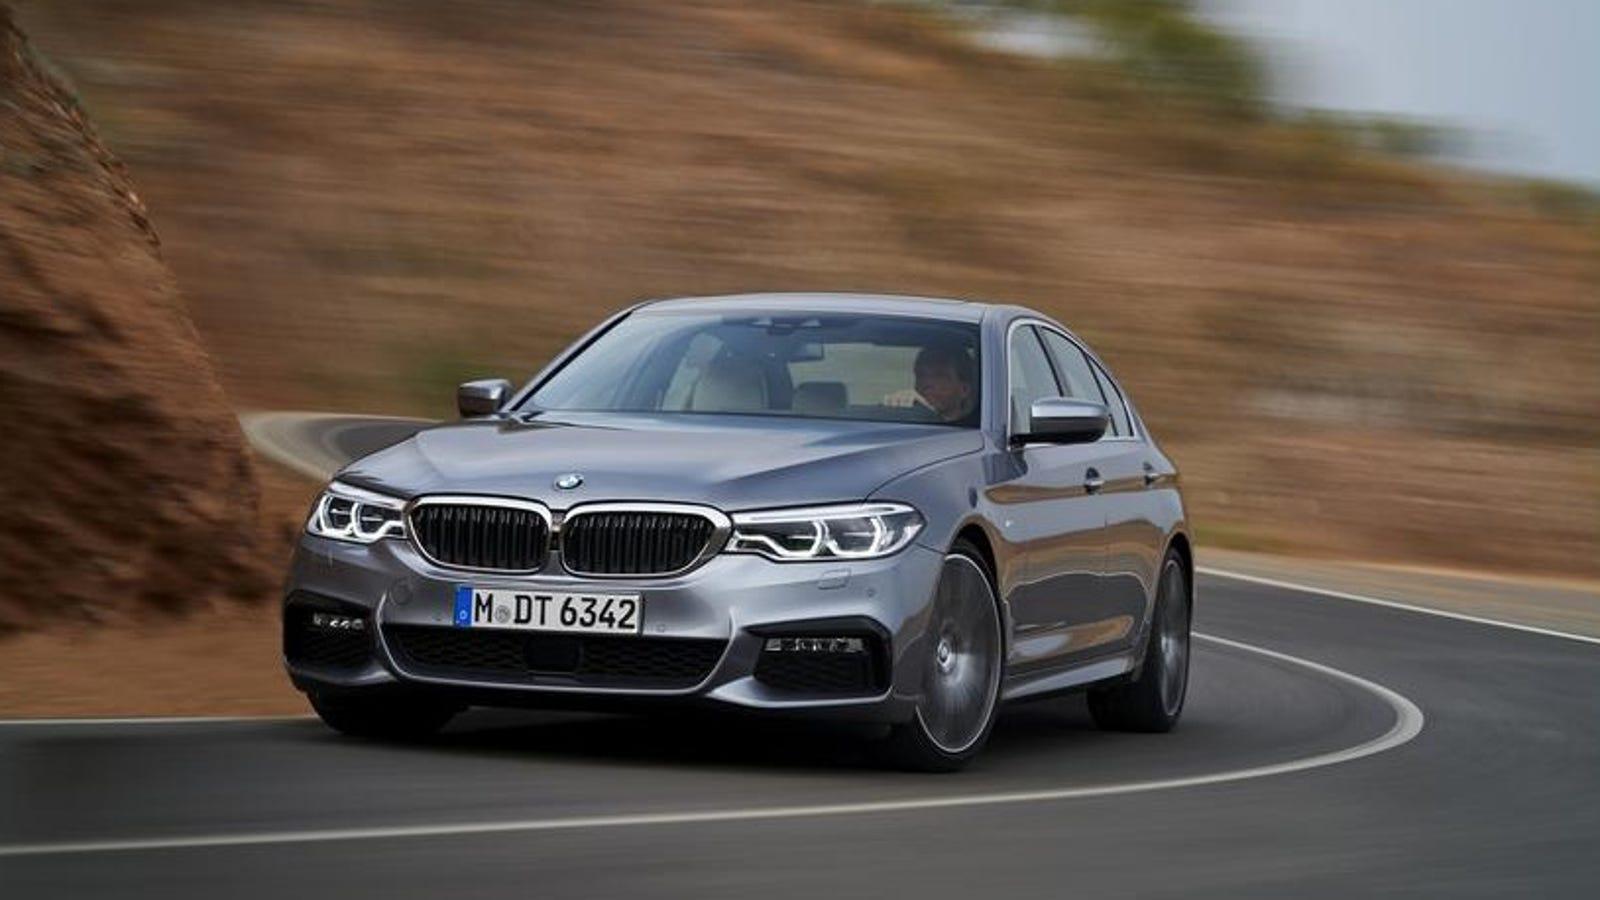 d6a2a091f4922a The 2017 BMW M550i Is Quicker Than The Current M5